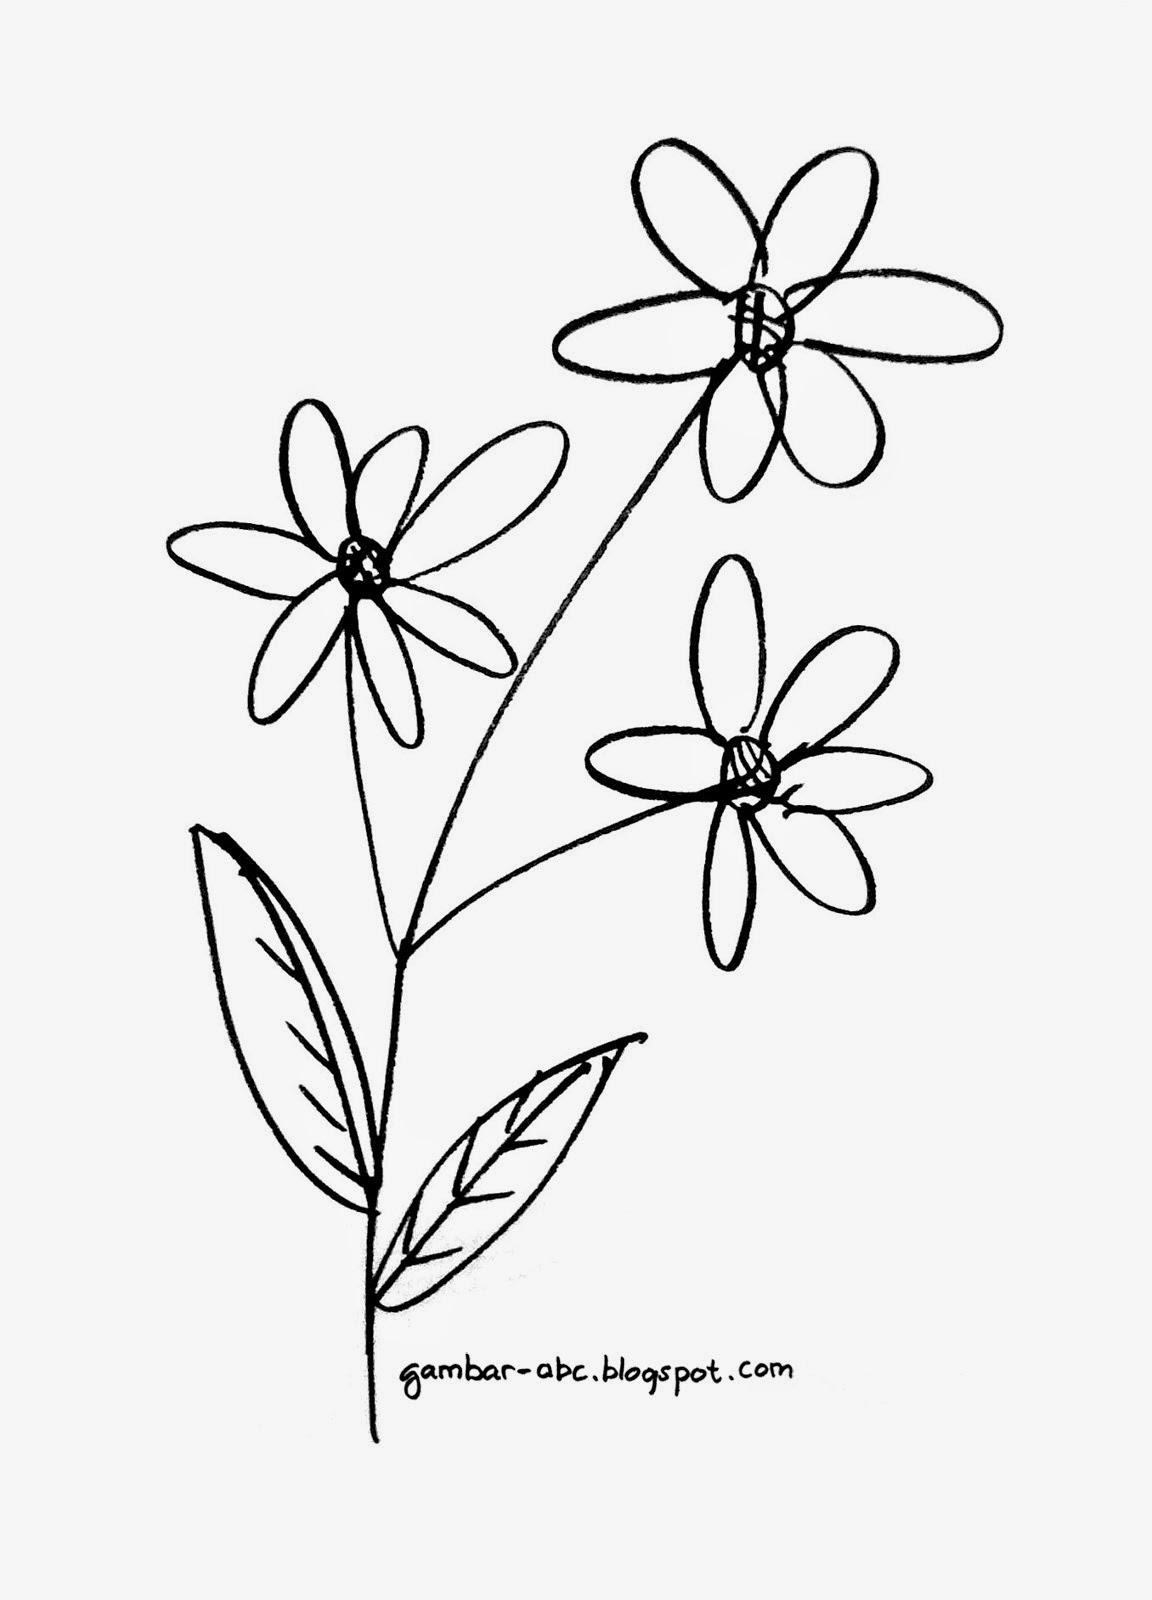 Mewarnai Bunga Mudah Sederhana  Contoh Gambar Mewarnai